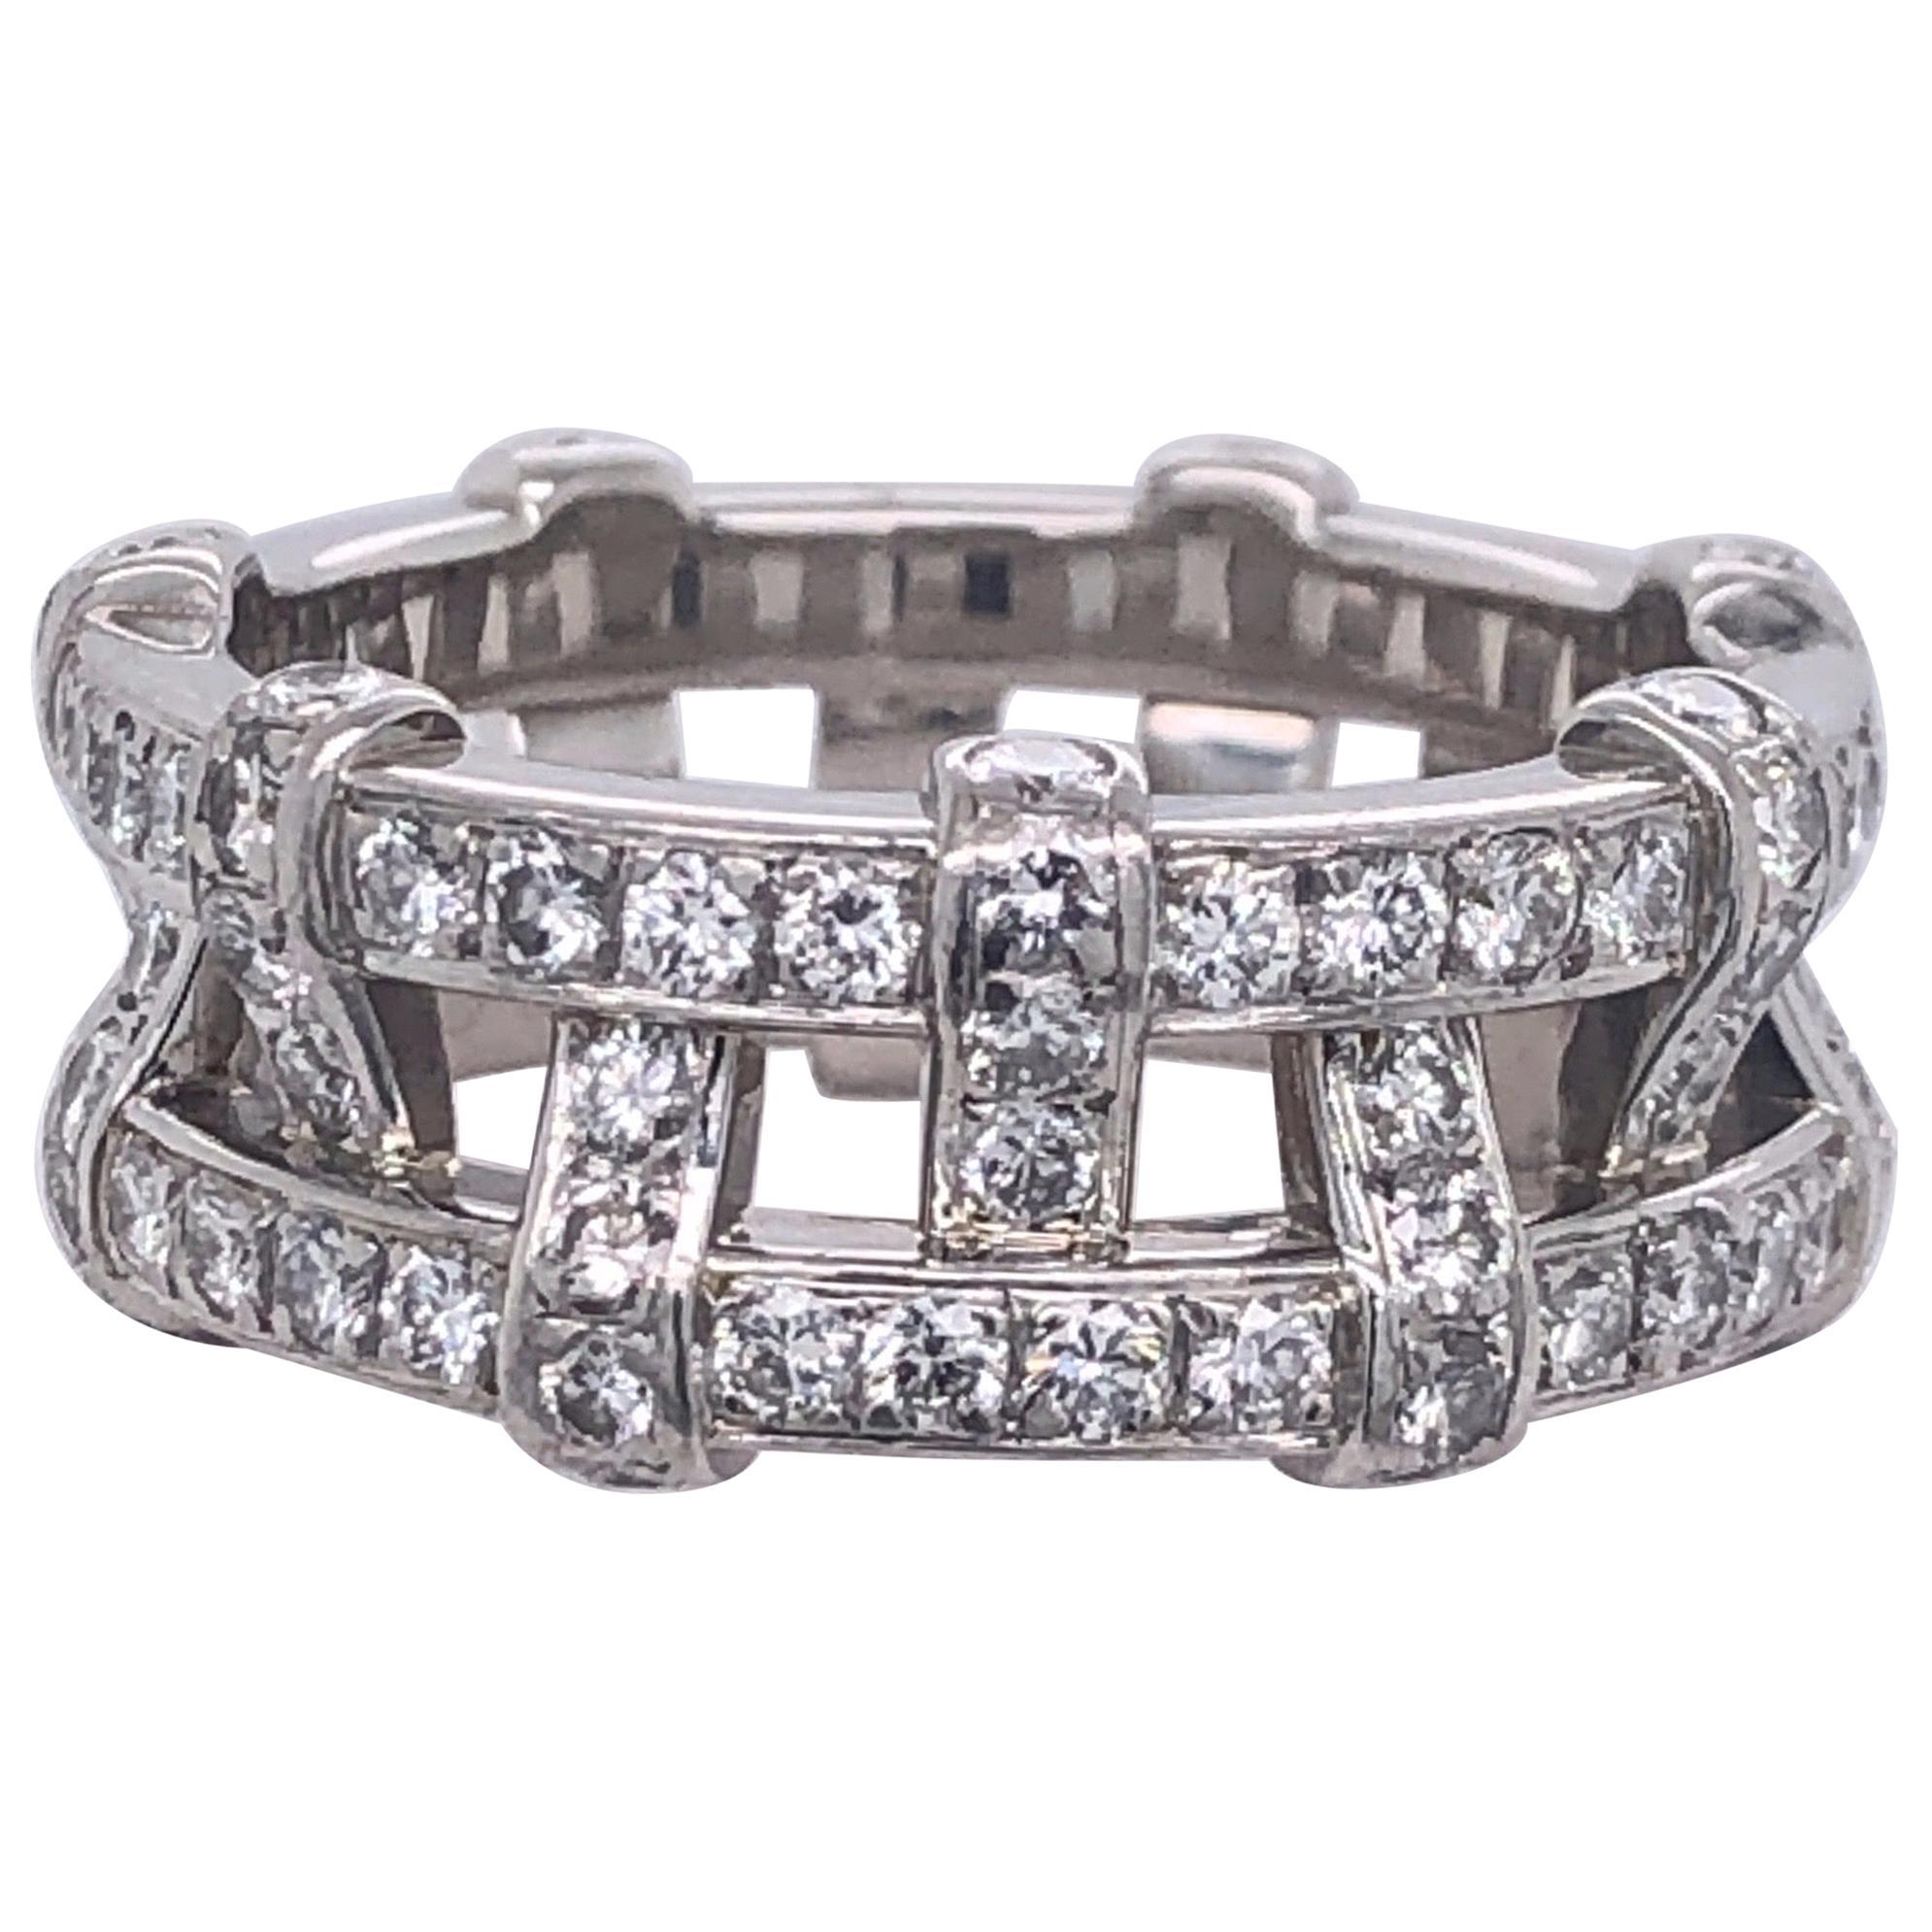 Tiffany & Co. Platinum Eternity Diamond Ring